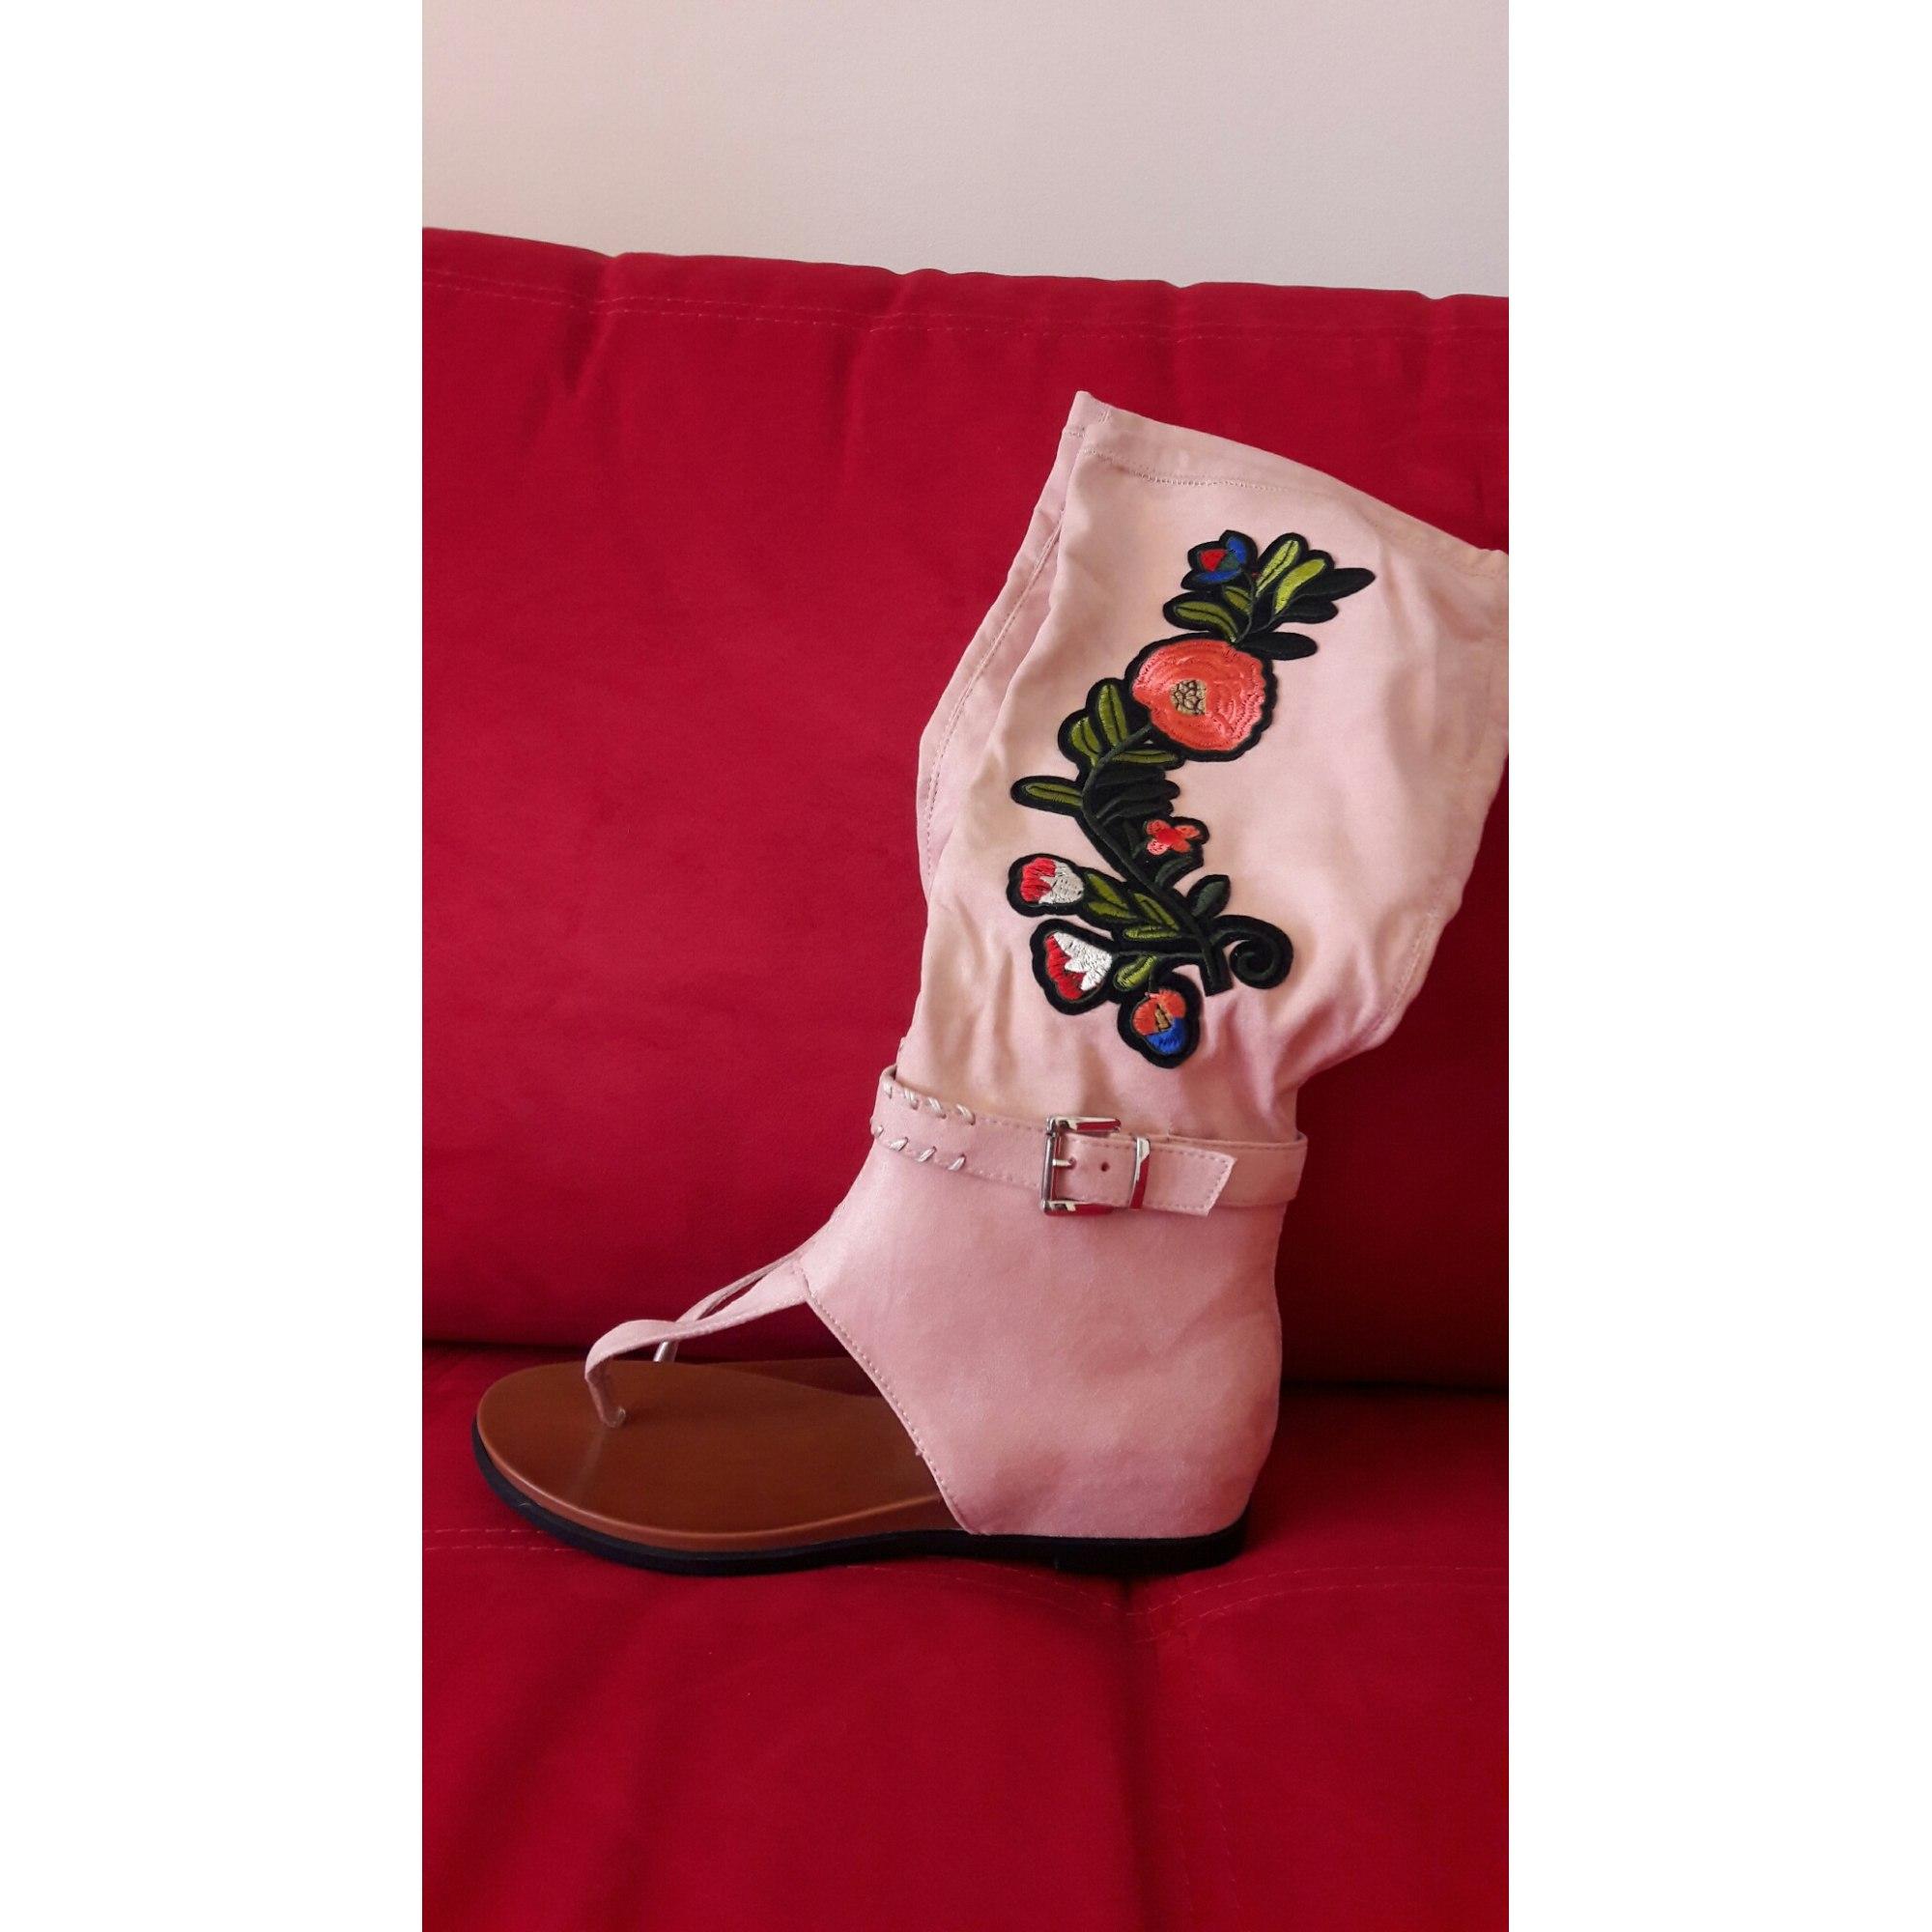 Sandales plates  NIO NIO Rose, fuschia, vieux rose